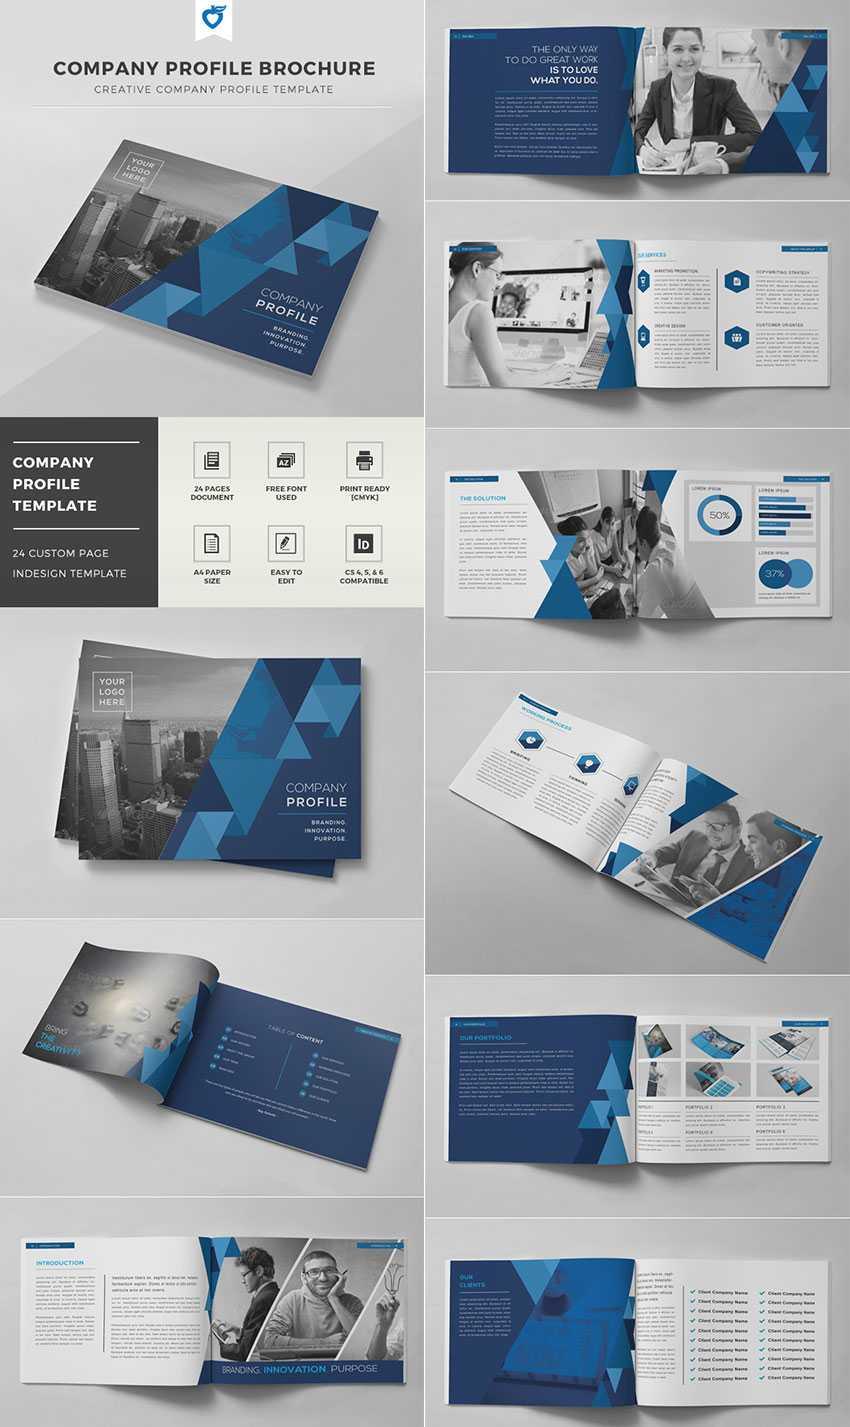 20 Кращих Шаблонів Indesign Brochure - Для Творчого Intended For Brochure Template Indesign Free Download